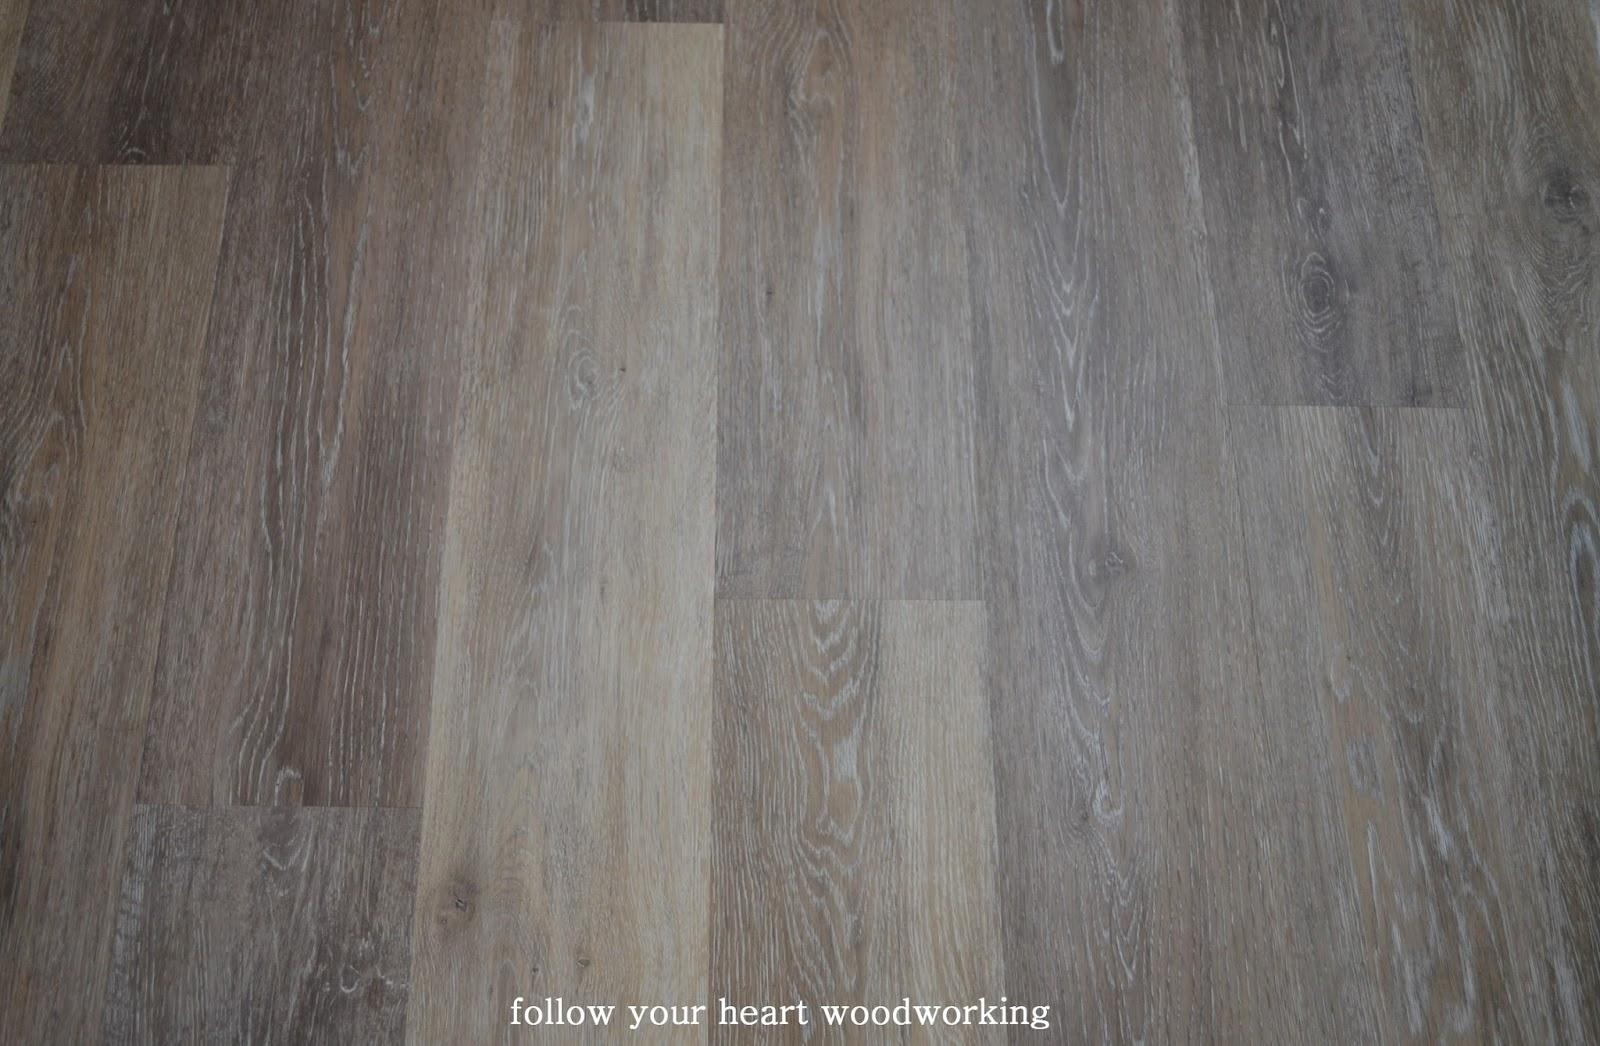 Follow Your Heart Woodworking Bathroom Renovation Part